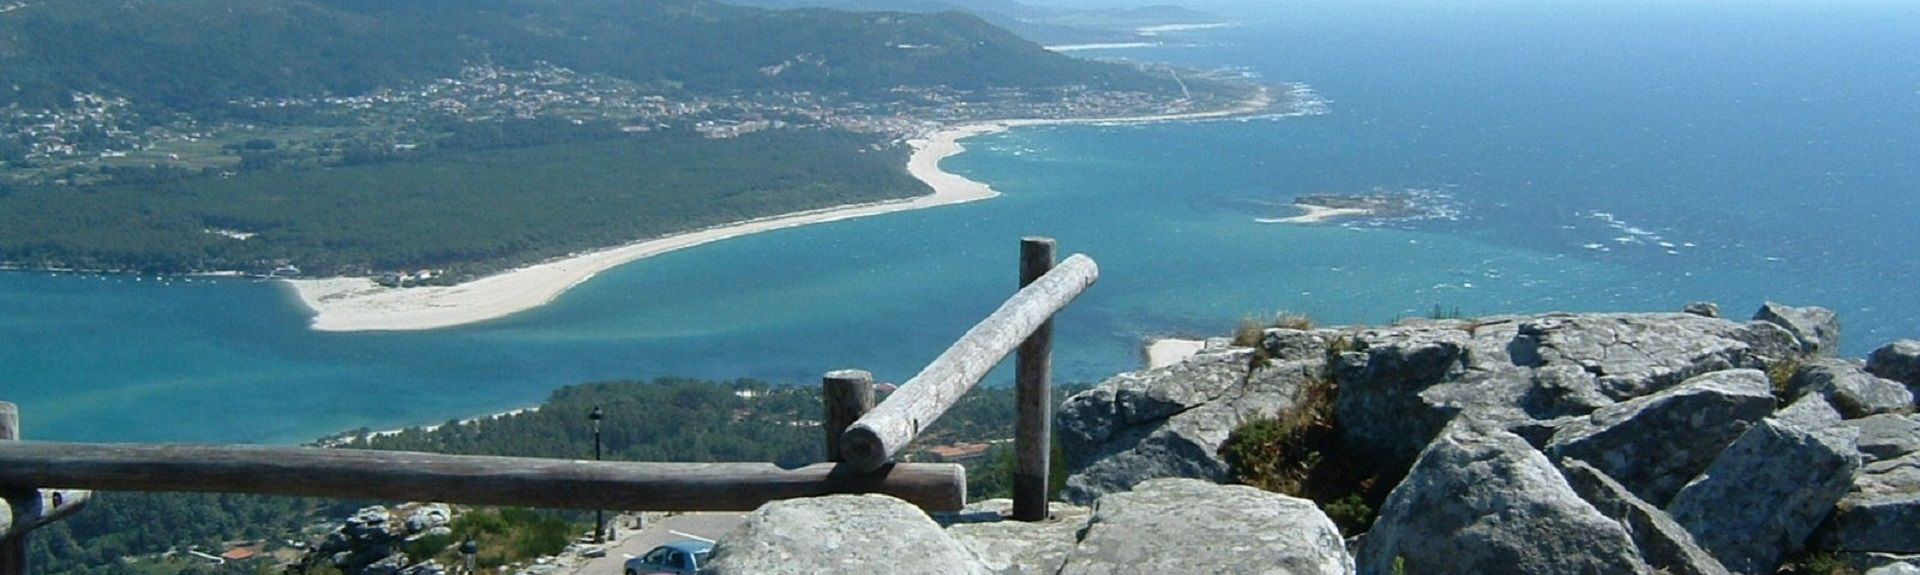 Real Aero Club de Vigo, Vigo, Galicien, Spanien